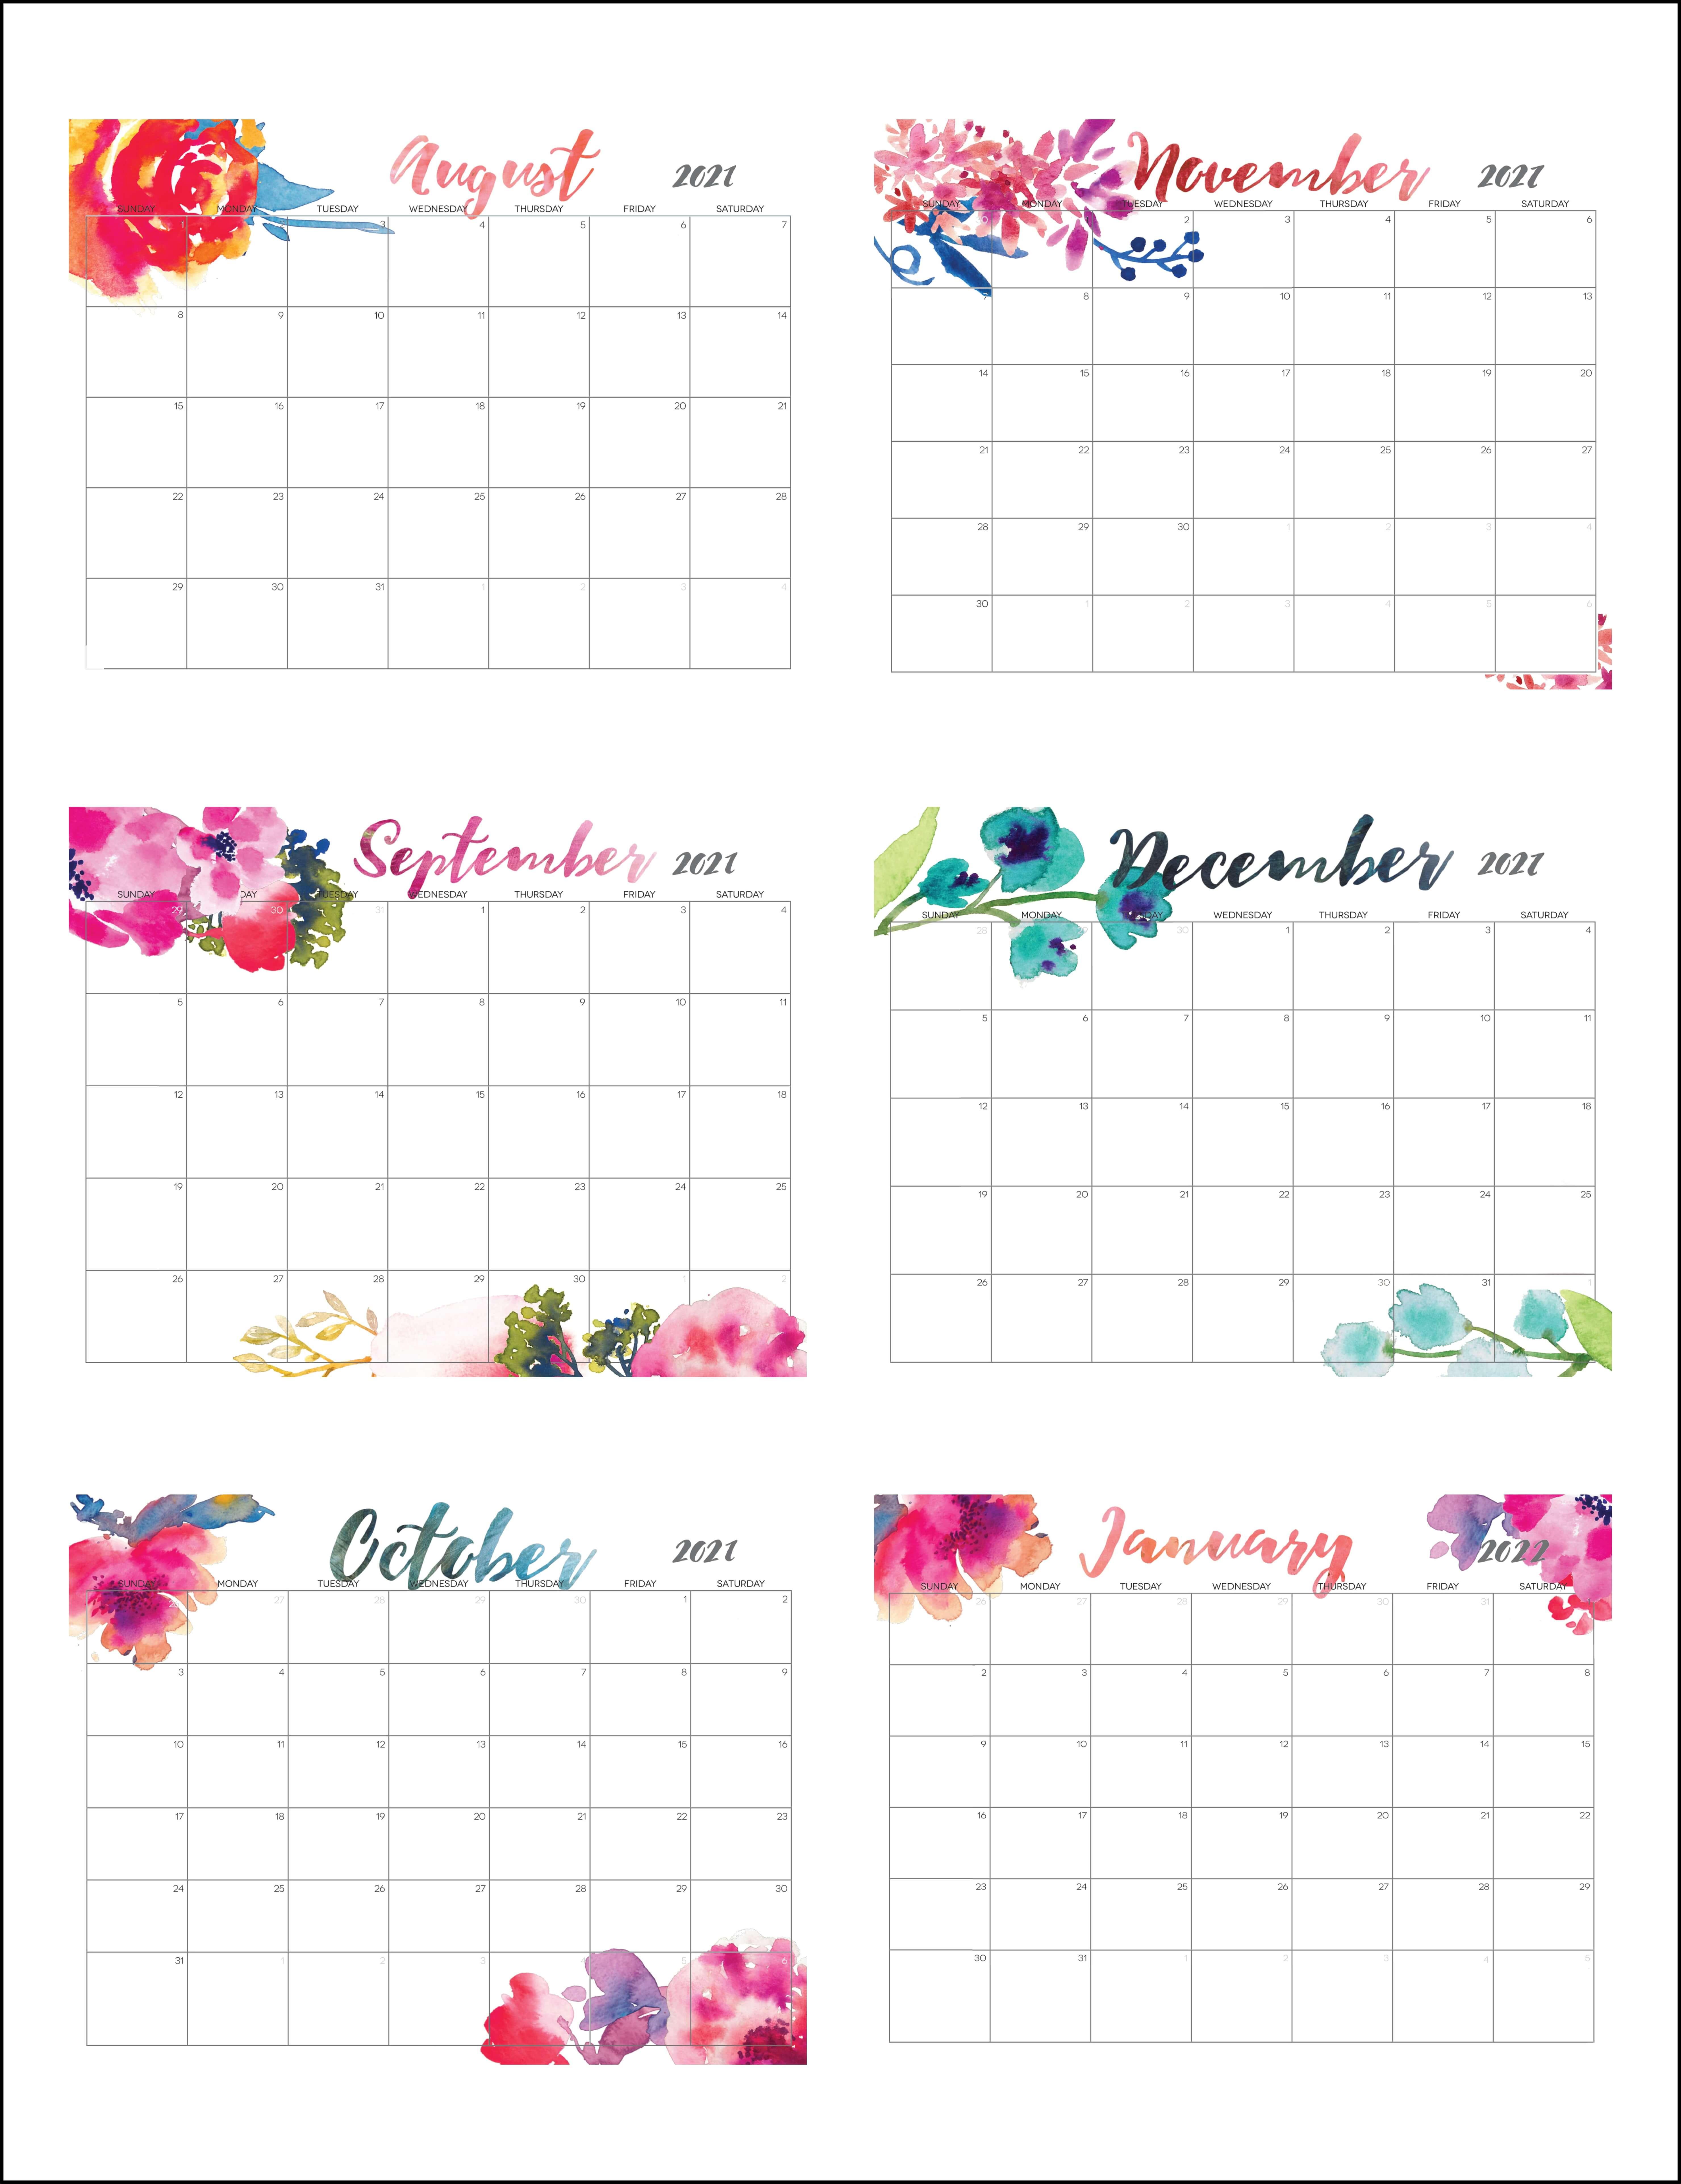 Cute August 2021 To January 2022 Calendar